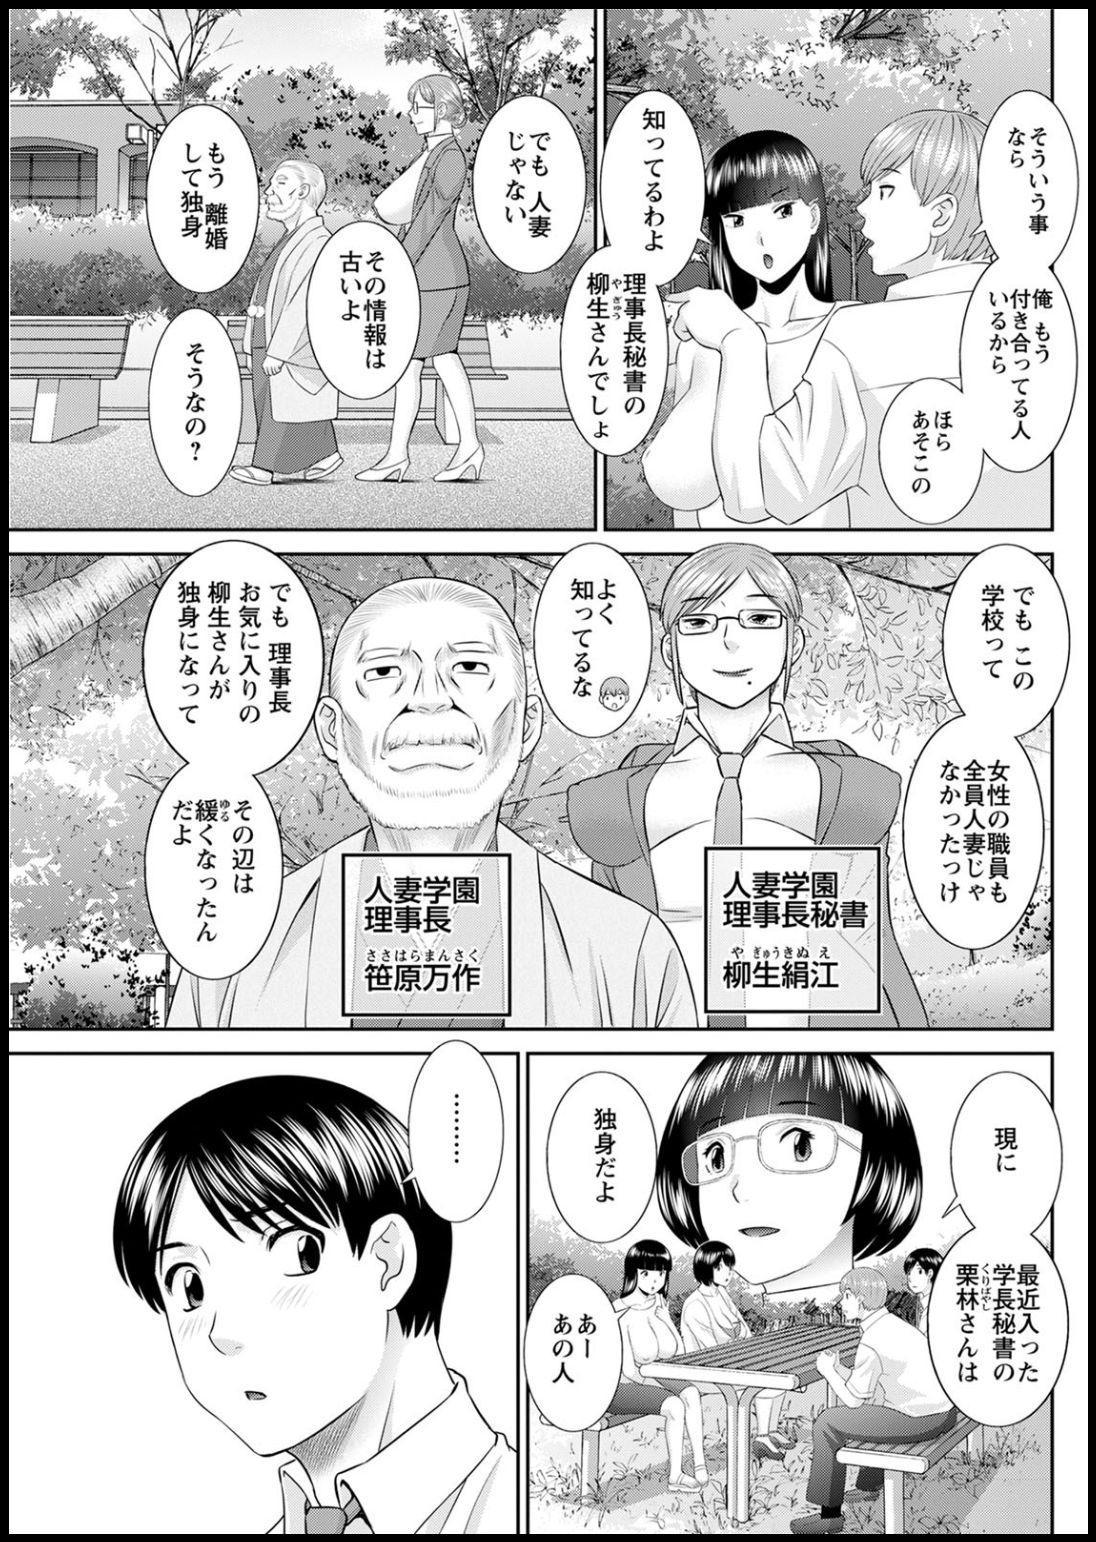 [Kawamori Misaki] Kaikan Hitotsuma Gakuen Ch. 1-6, 8-20 [Digital] 277